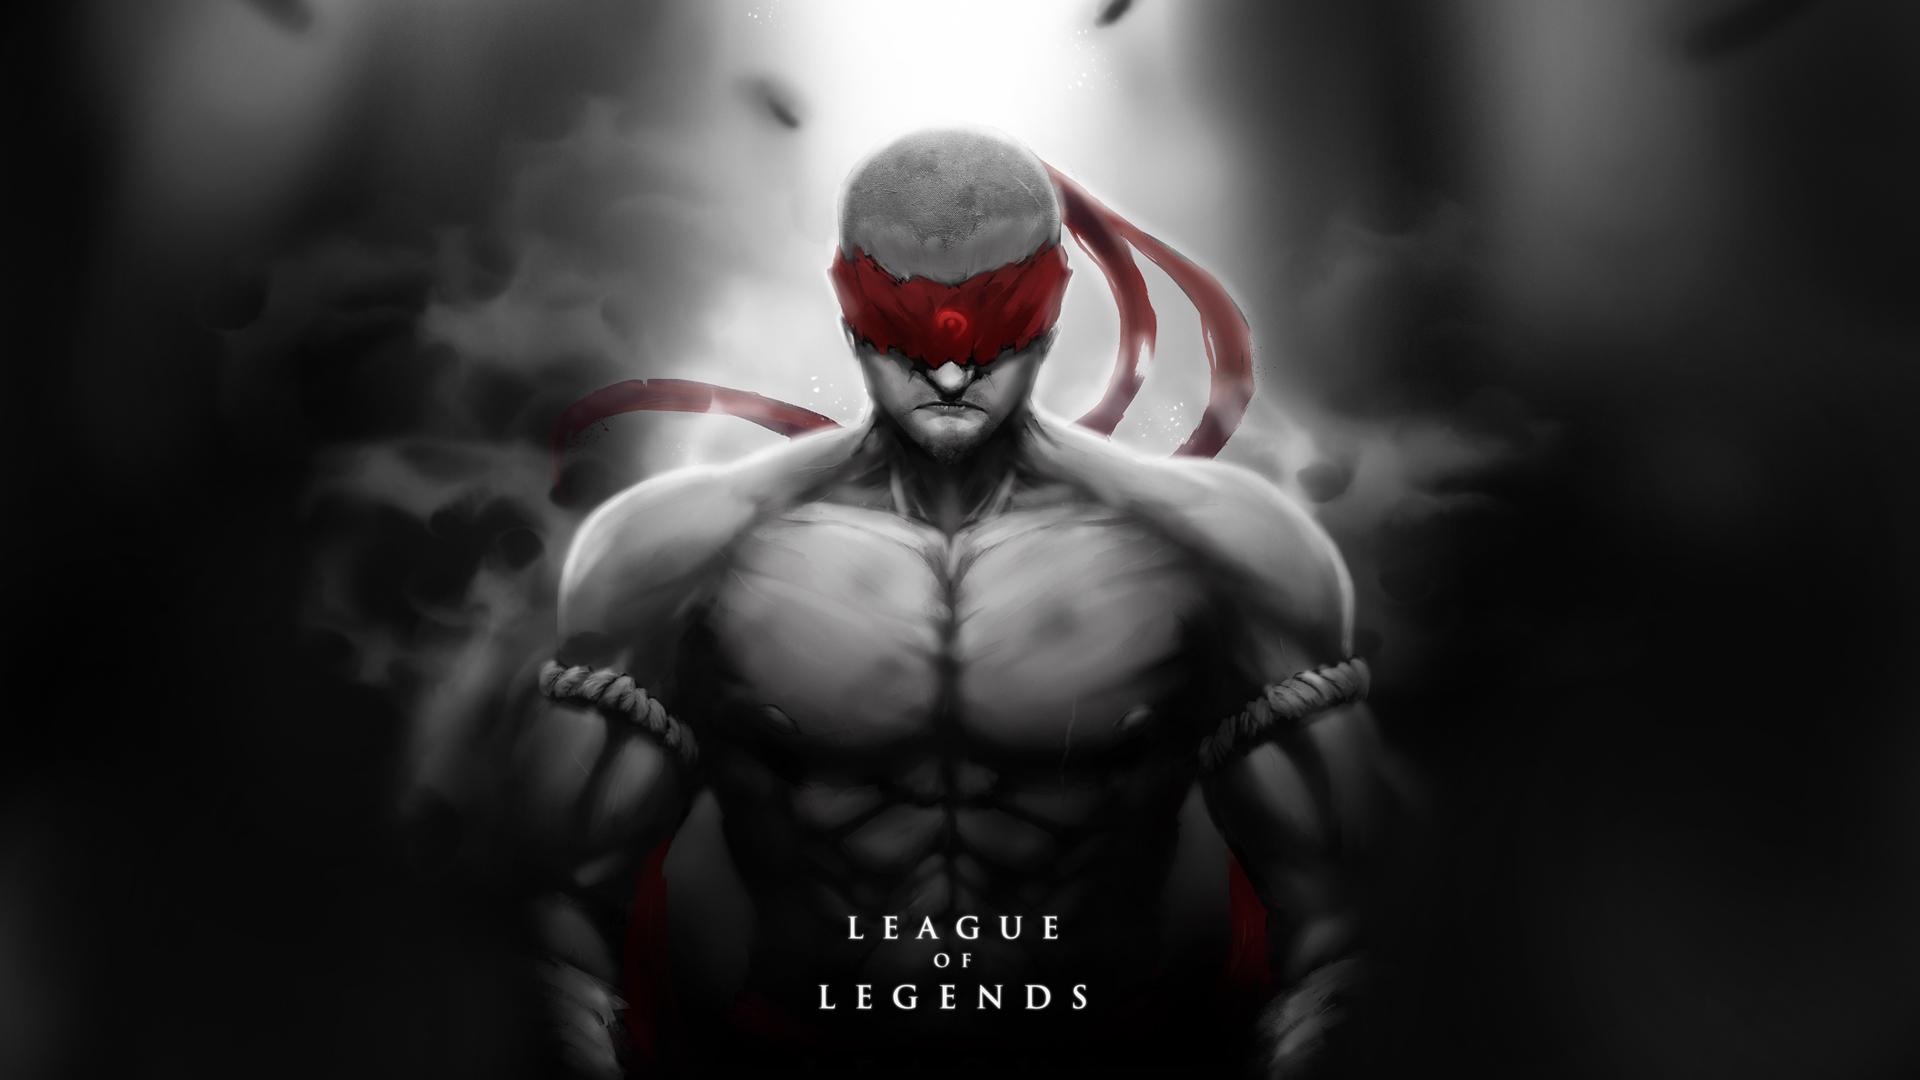 League of Legends wallpaper 108